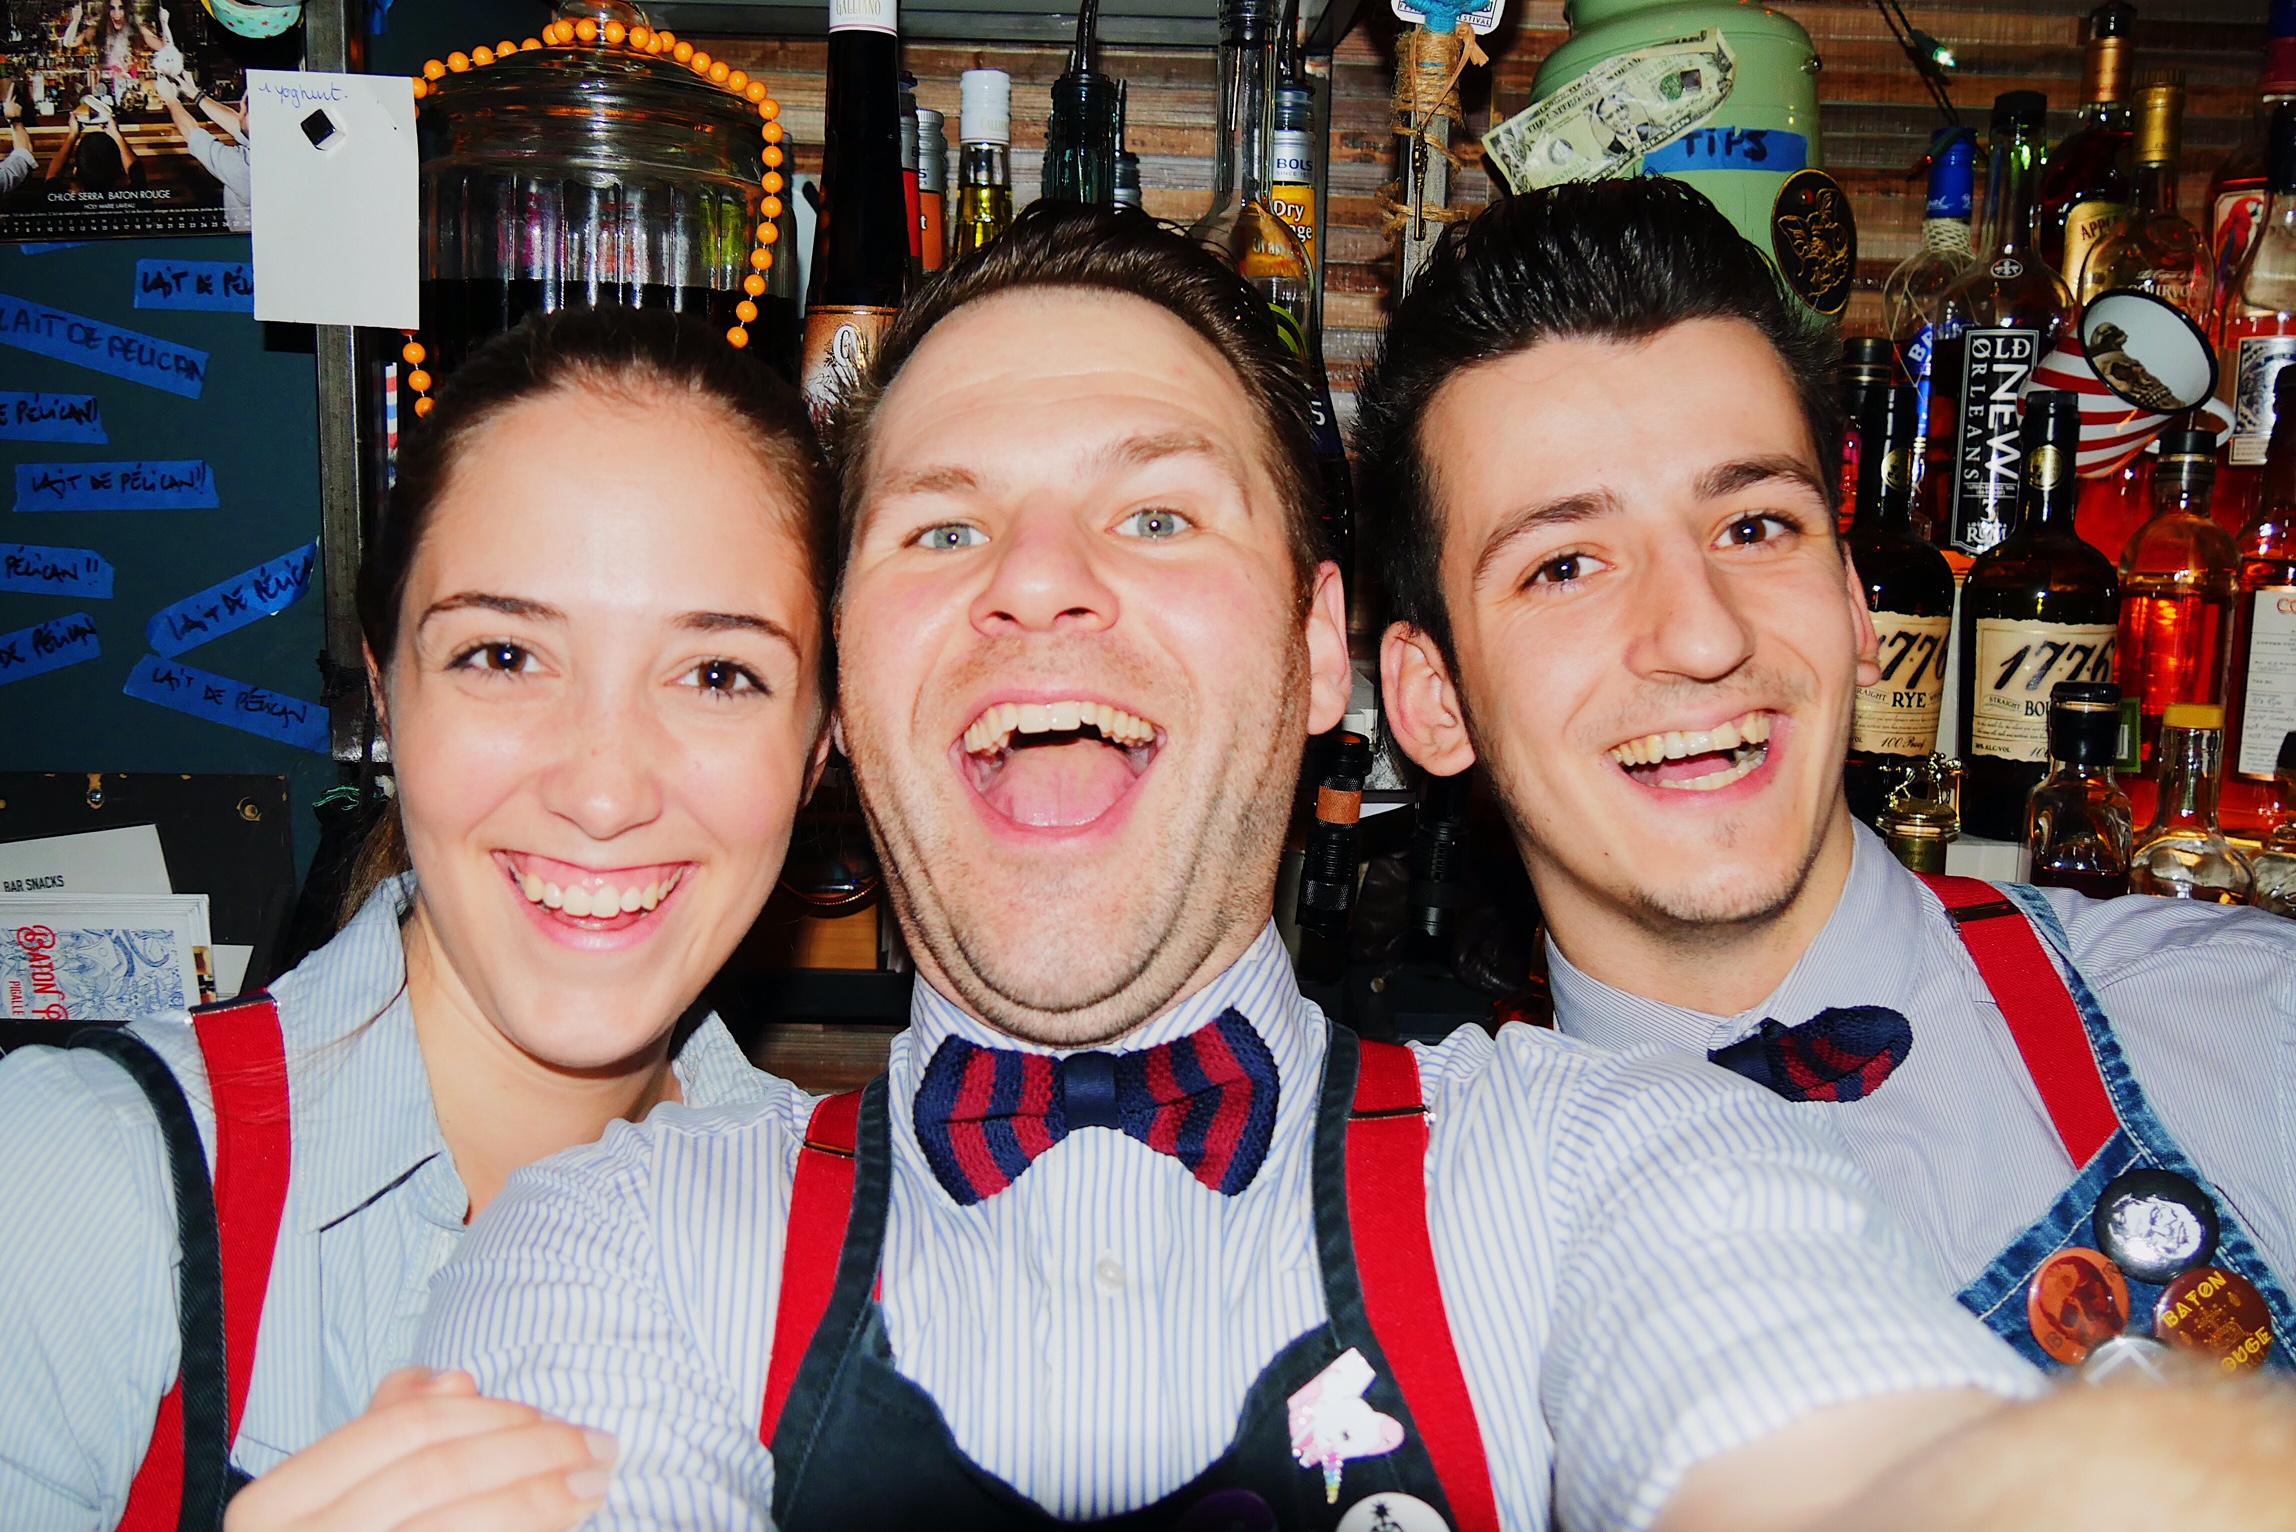 Bar Baton Rouge Paris Joseph Biolatto Julien Escot selfie original pour usofparis blog